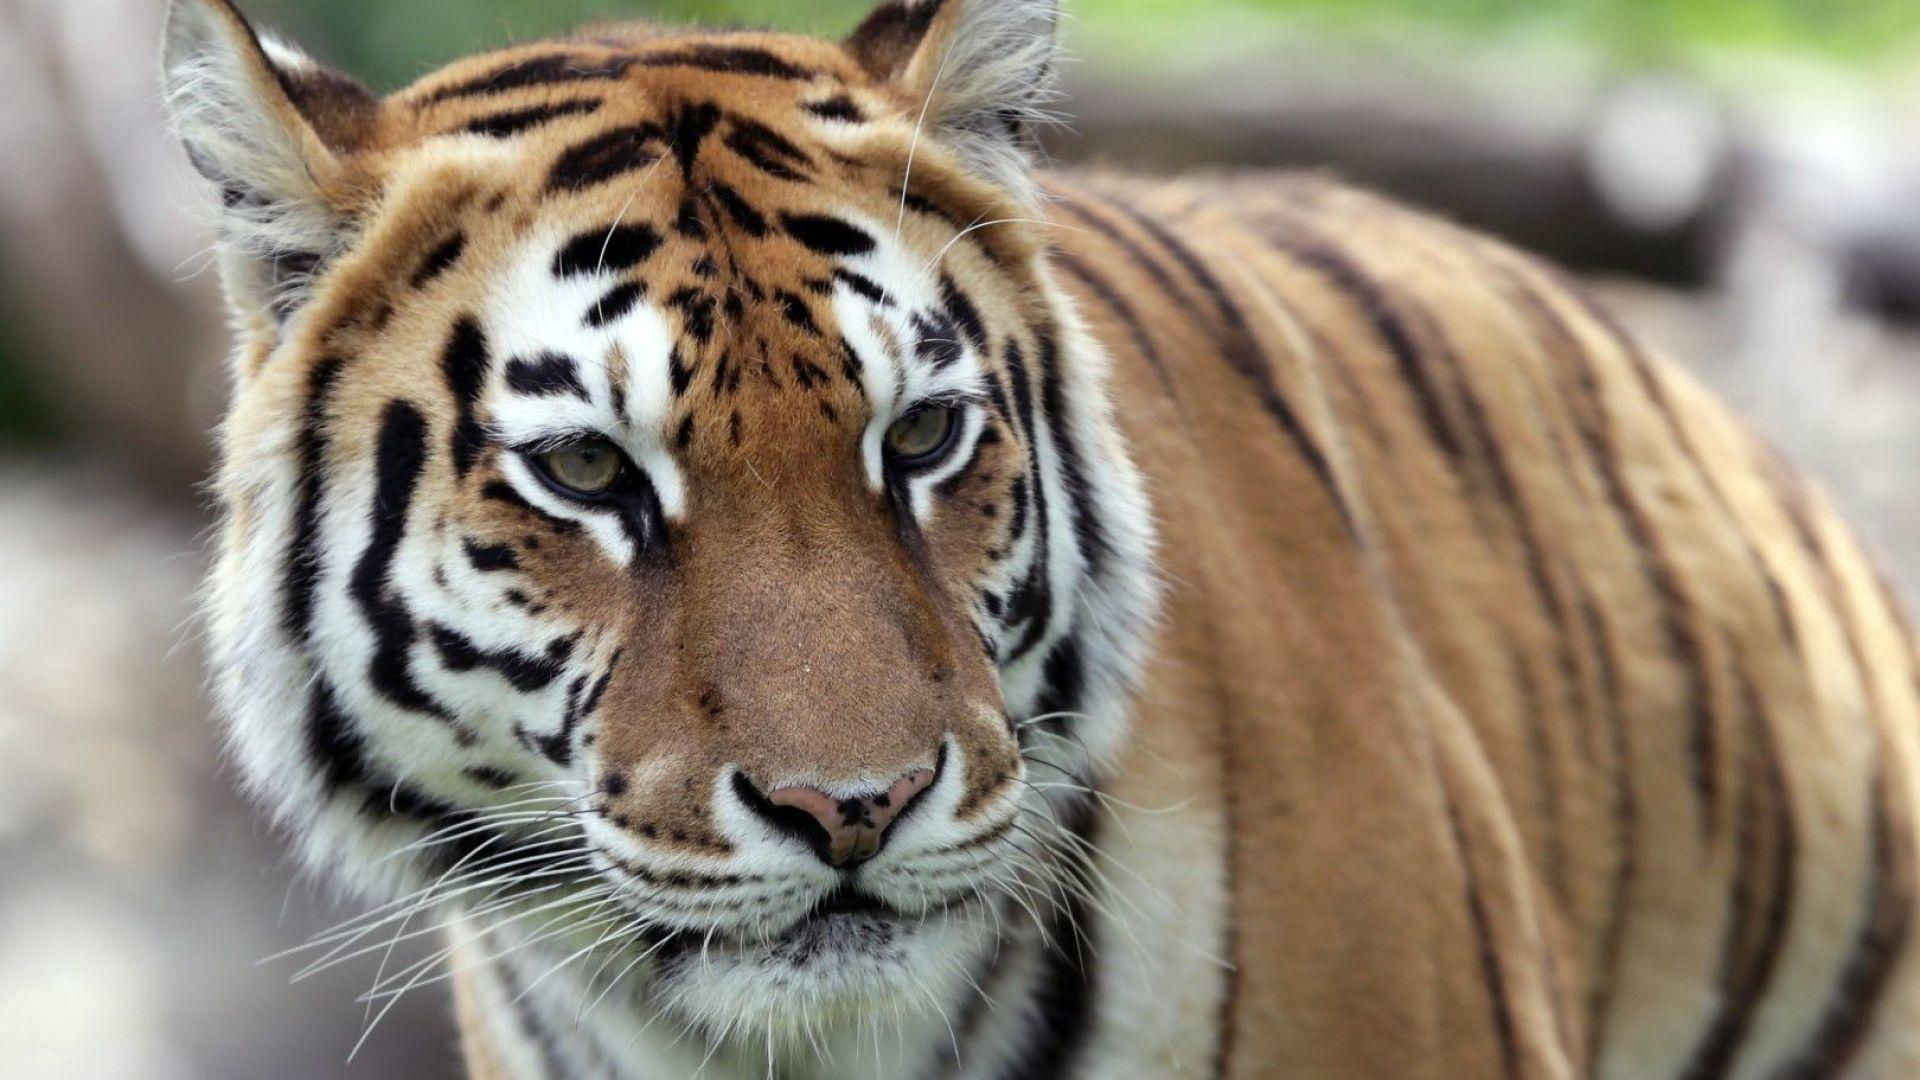 Софийската зоологическа градина стана на 130 години (снимки)